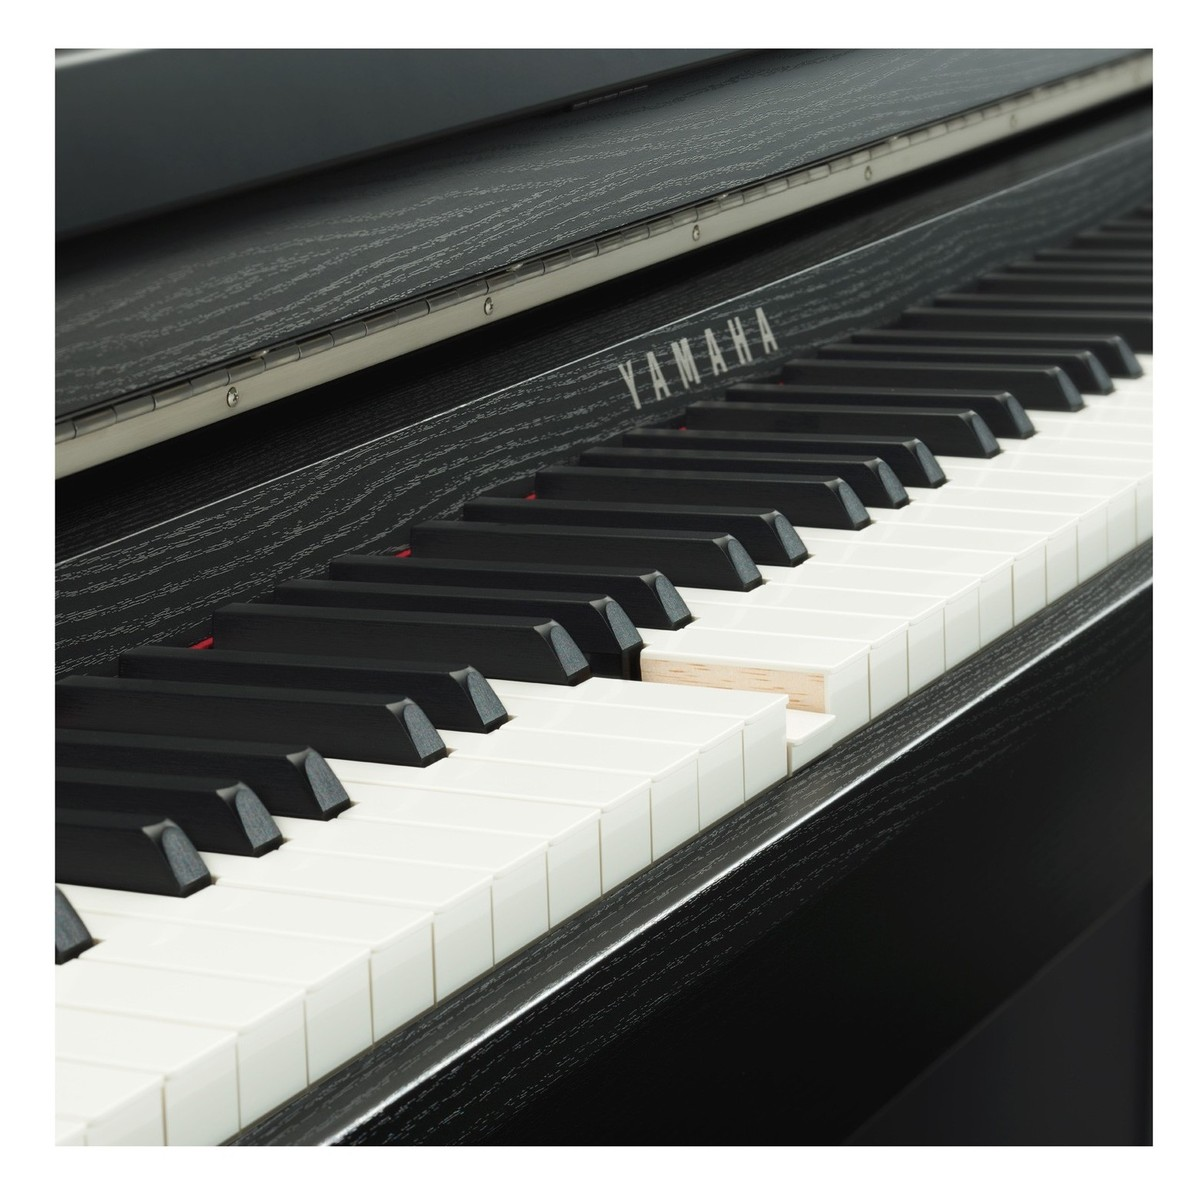 yamaha clp 685 digital piano package satin black at. Black Bedroom Furniture Sets. Home Design Ideas